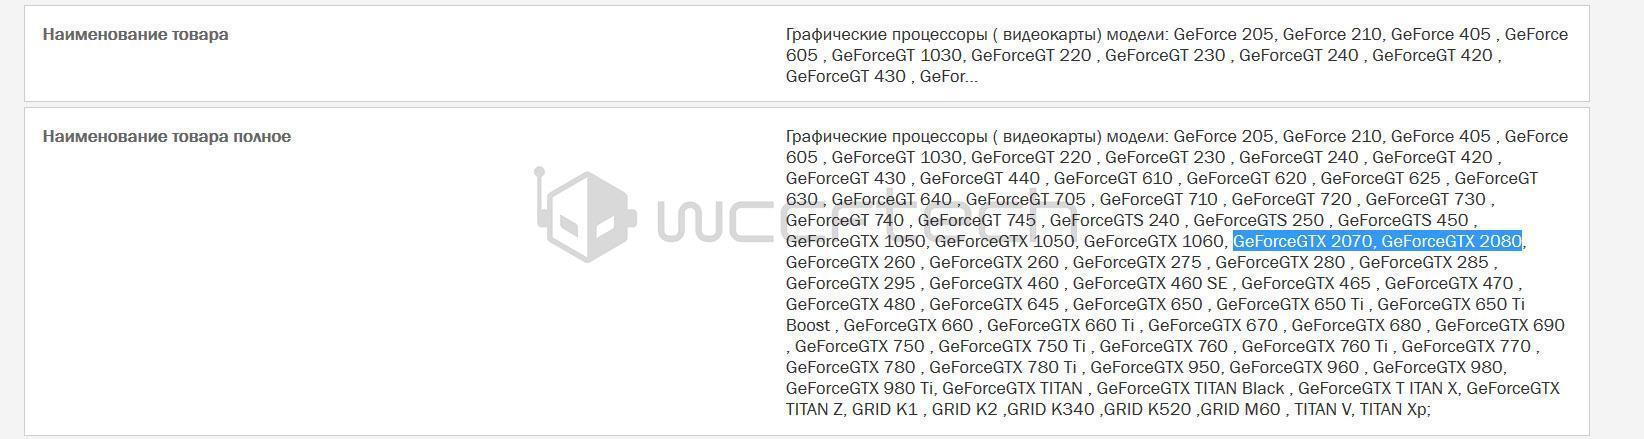 NVIDIA GeForce GTX 2080 PCB leaked pre-Gamescom - SlashGear